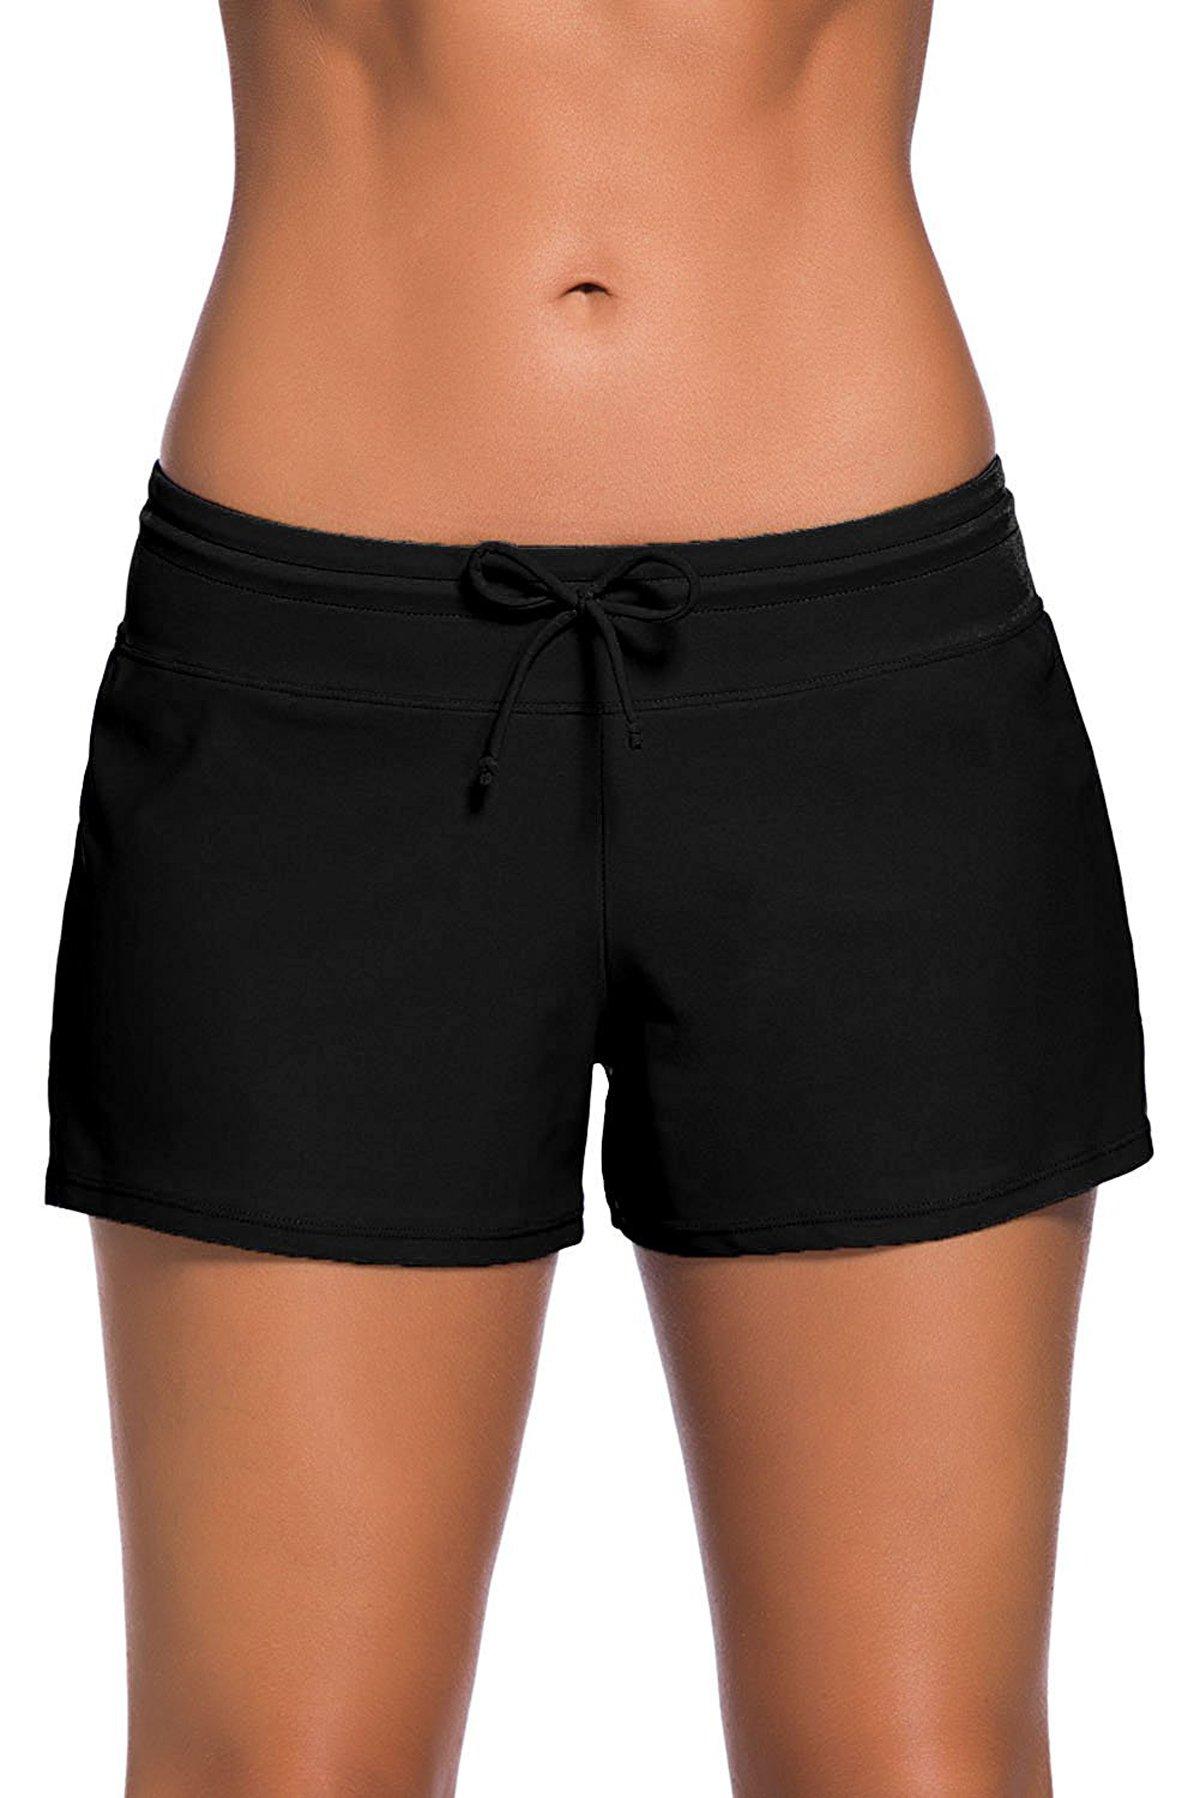 DNggAND Women's Plus Size Boyleg Swimwear Tankini Bottom Board Shorts FBA(Black, (US 12-14) L)